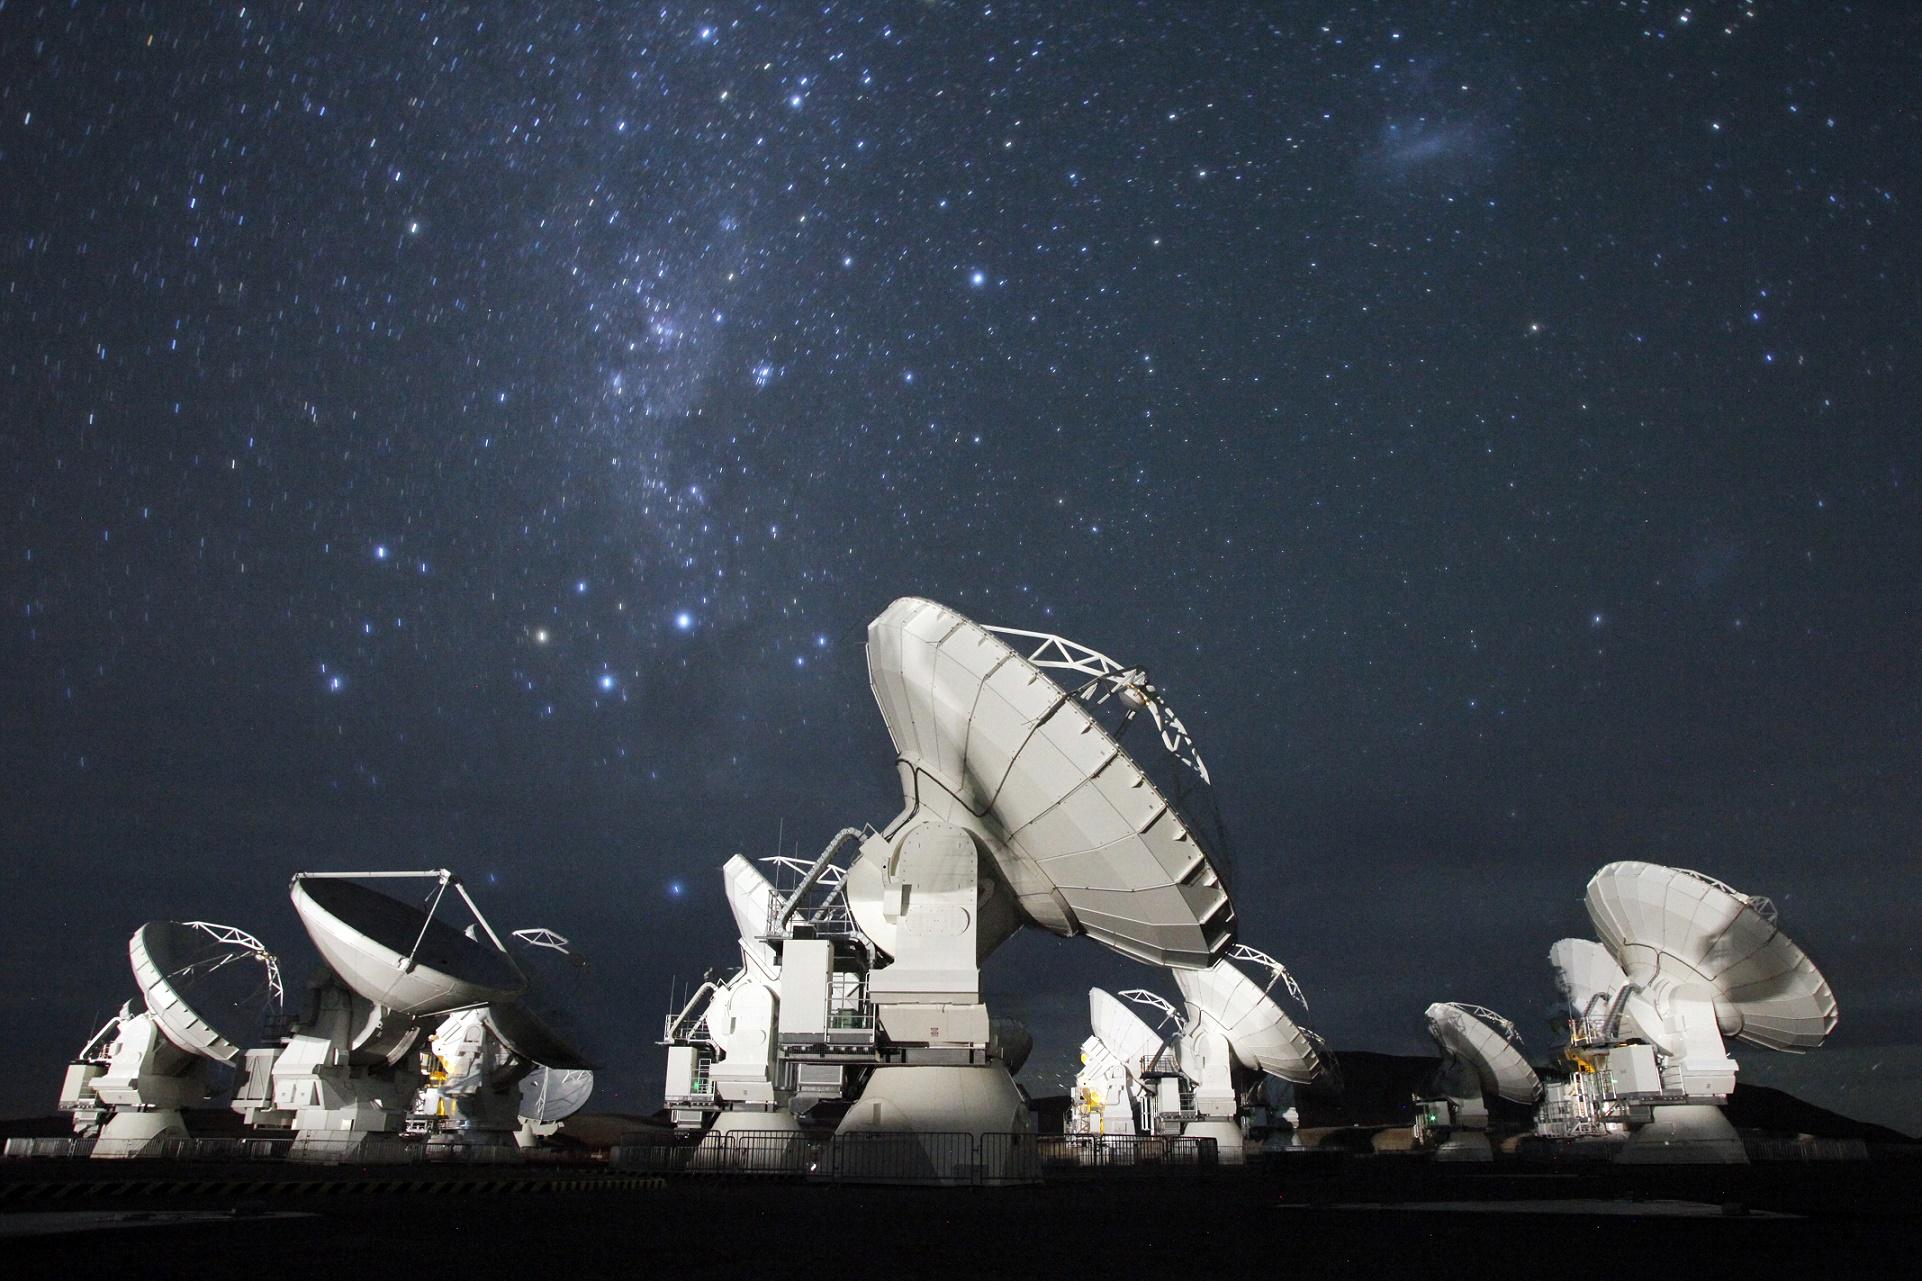 O projeto Sonidos de ALMA – a sigla vem de Atacama Large Millimiter Array, é a maior rede de telescópios do mundo